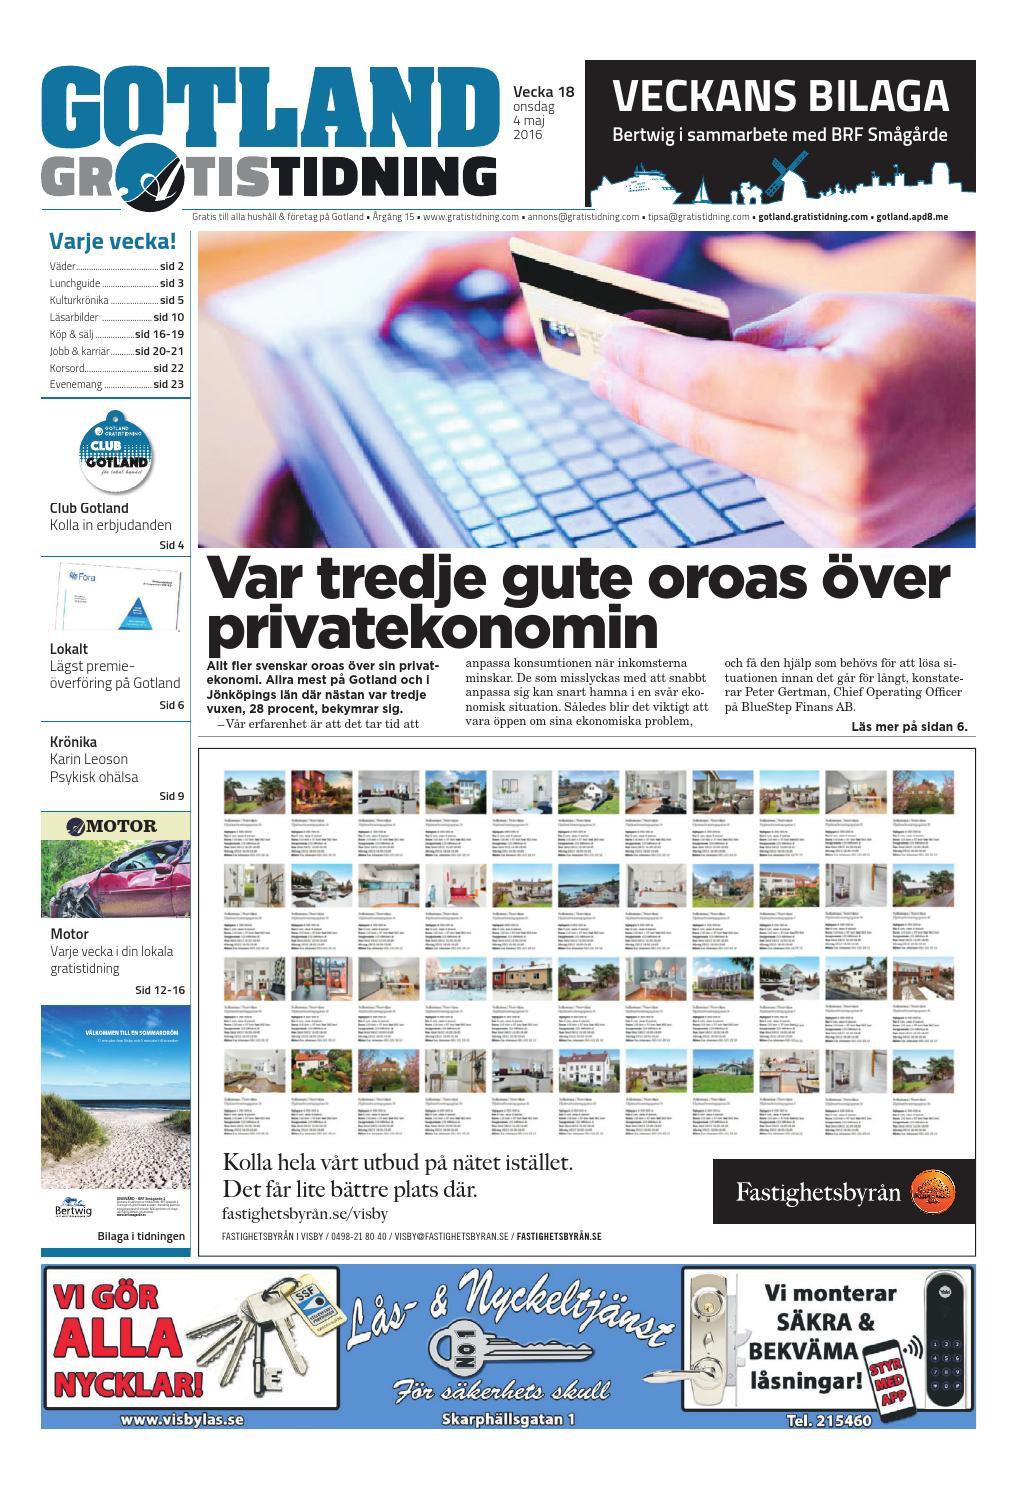 87c3dd7e0e9 Gotland Gratistidning by Svenska Civildatalogerna AB - issuu